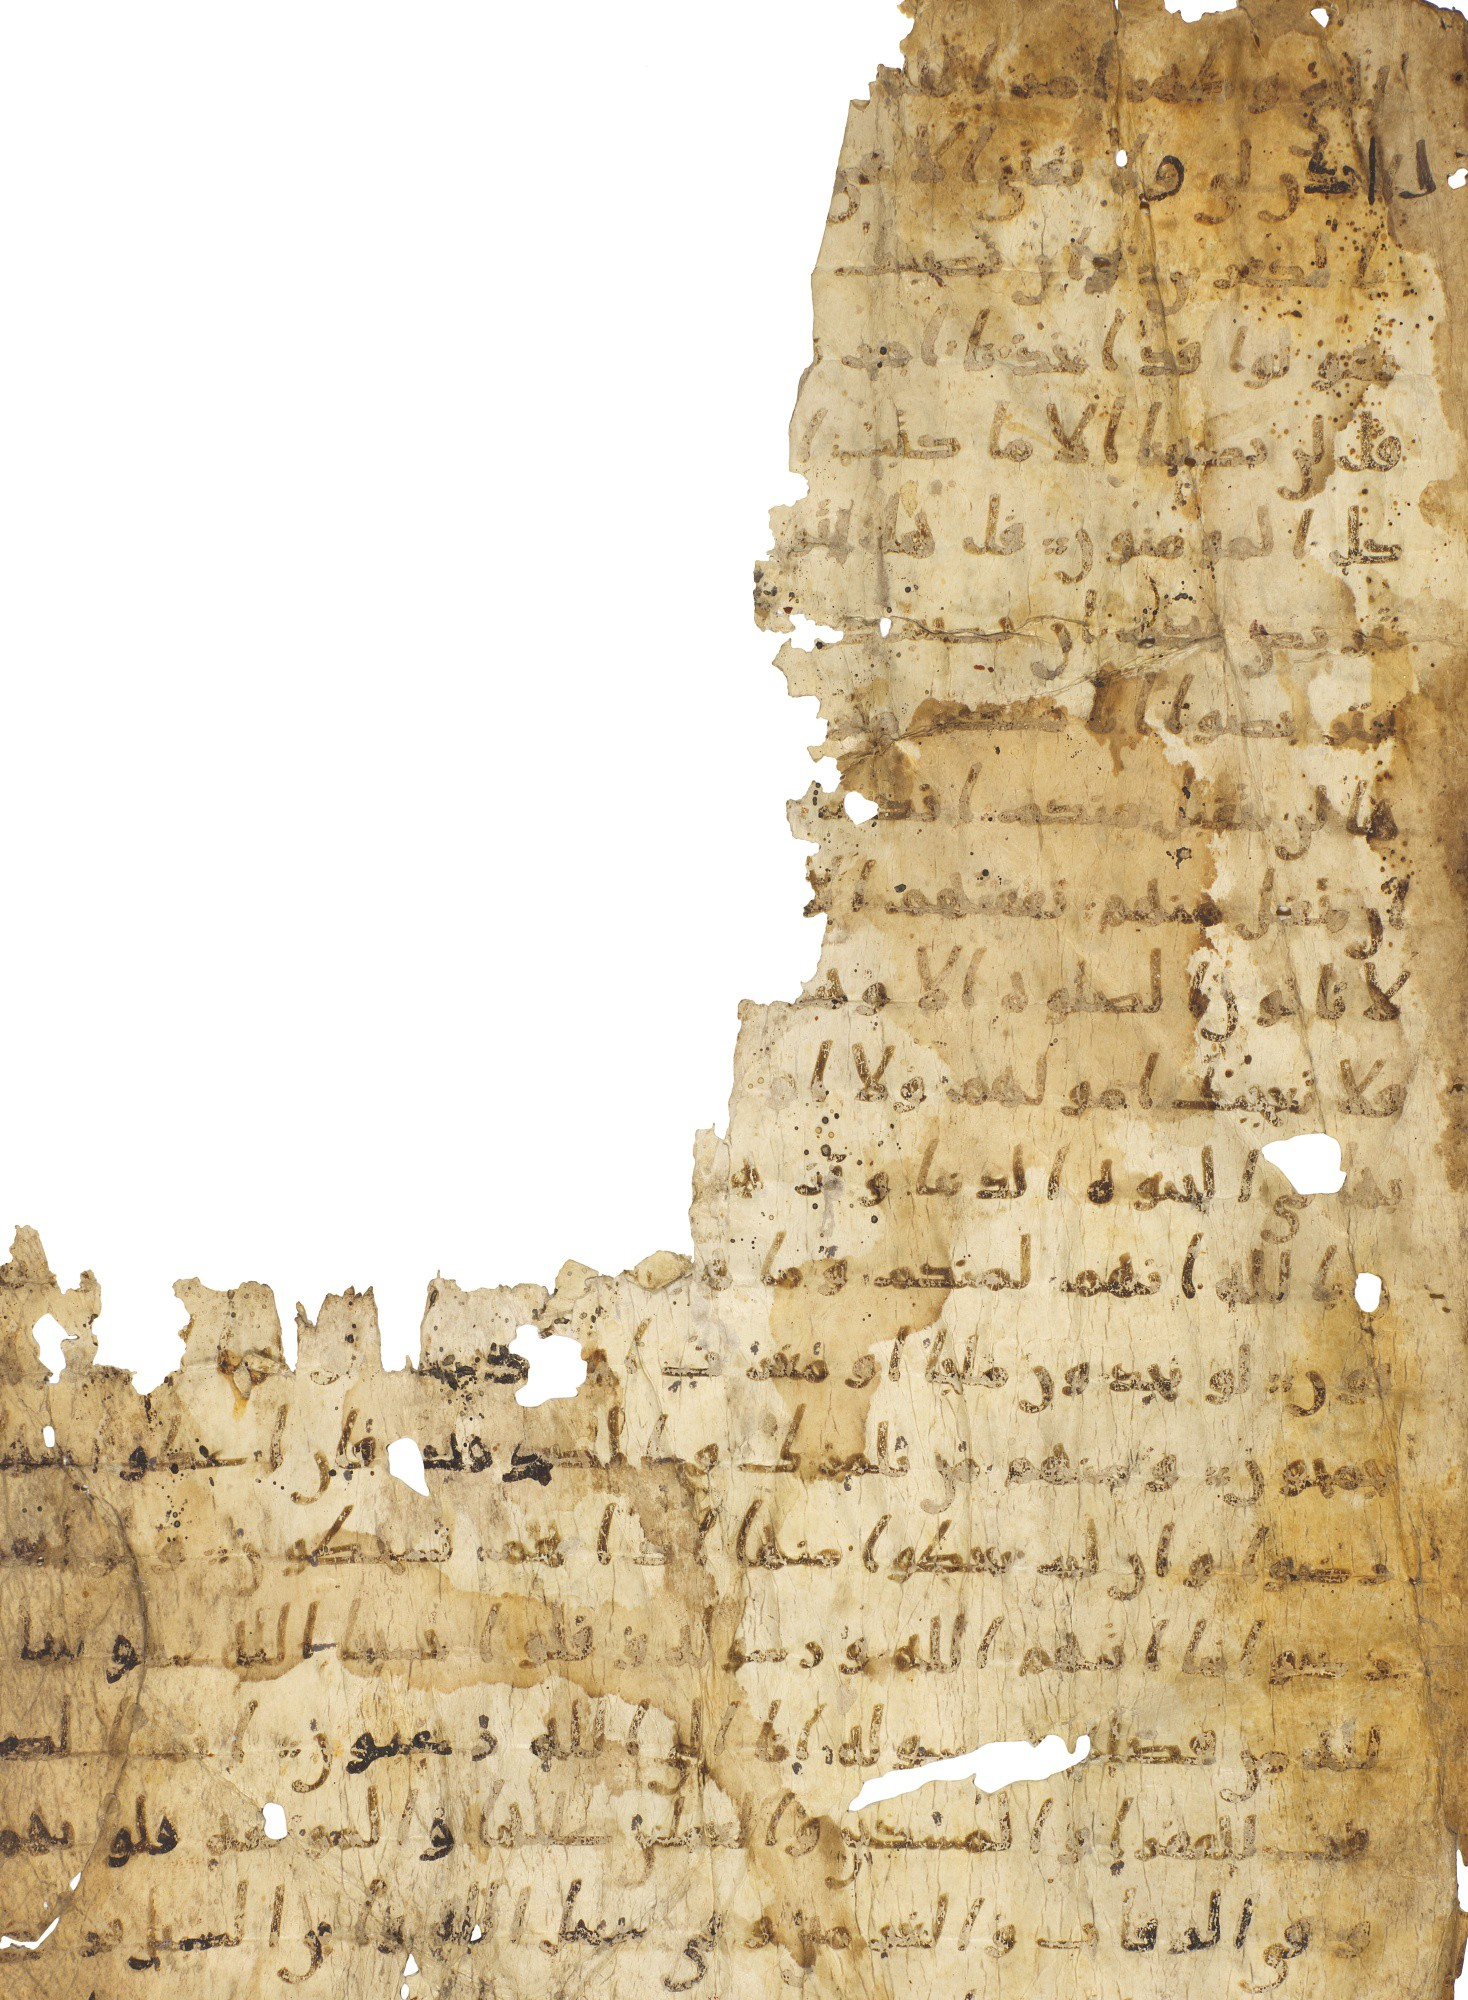 AN EARLY QUR'AN LEAF IN HIJAZI SCRIPT ON VELLUM, ARABIAN PENINSULA, SECOND HALF 7TH CENTURY AD